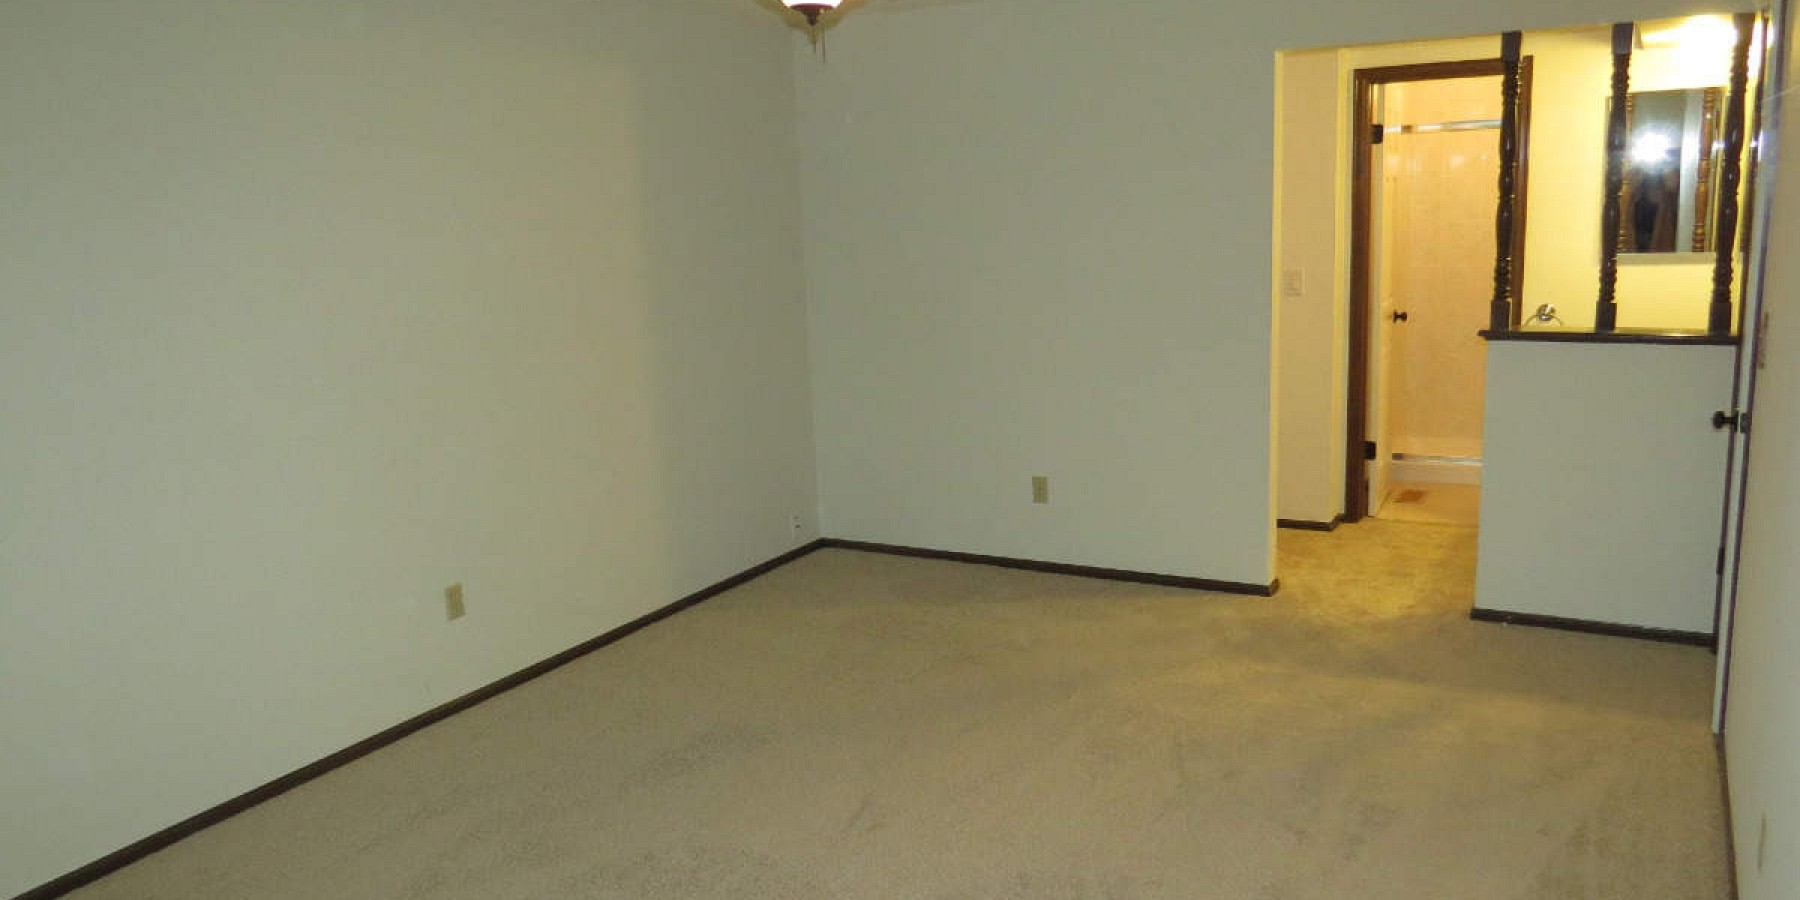 6512 South Vance Street, Littleton, CO 80123